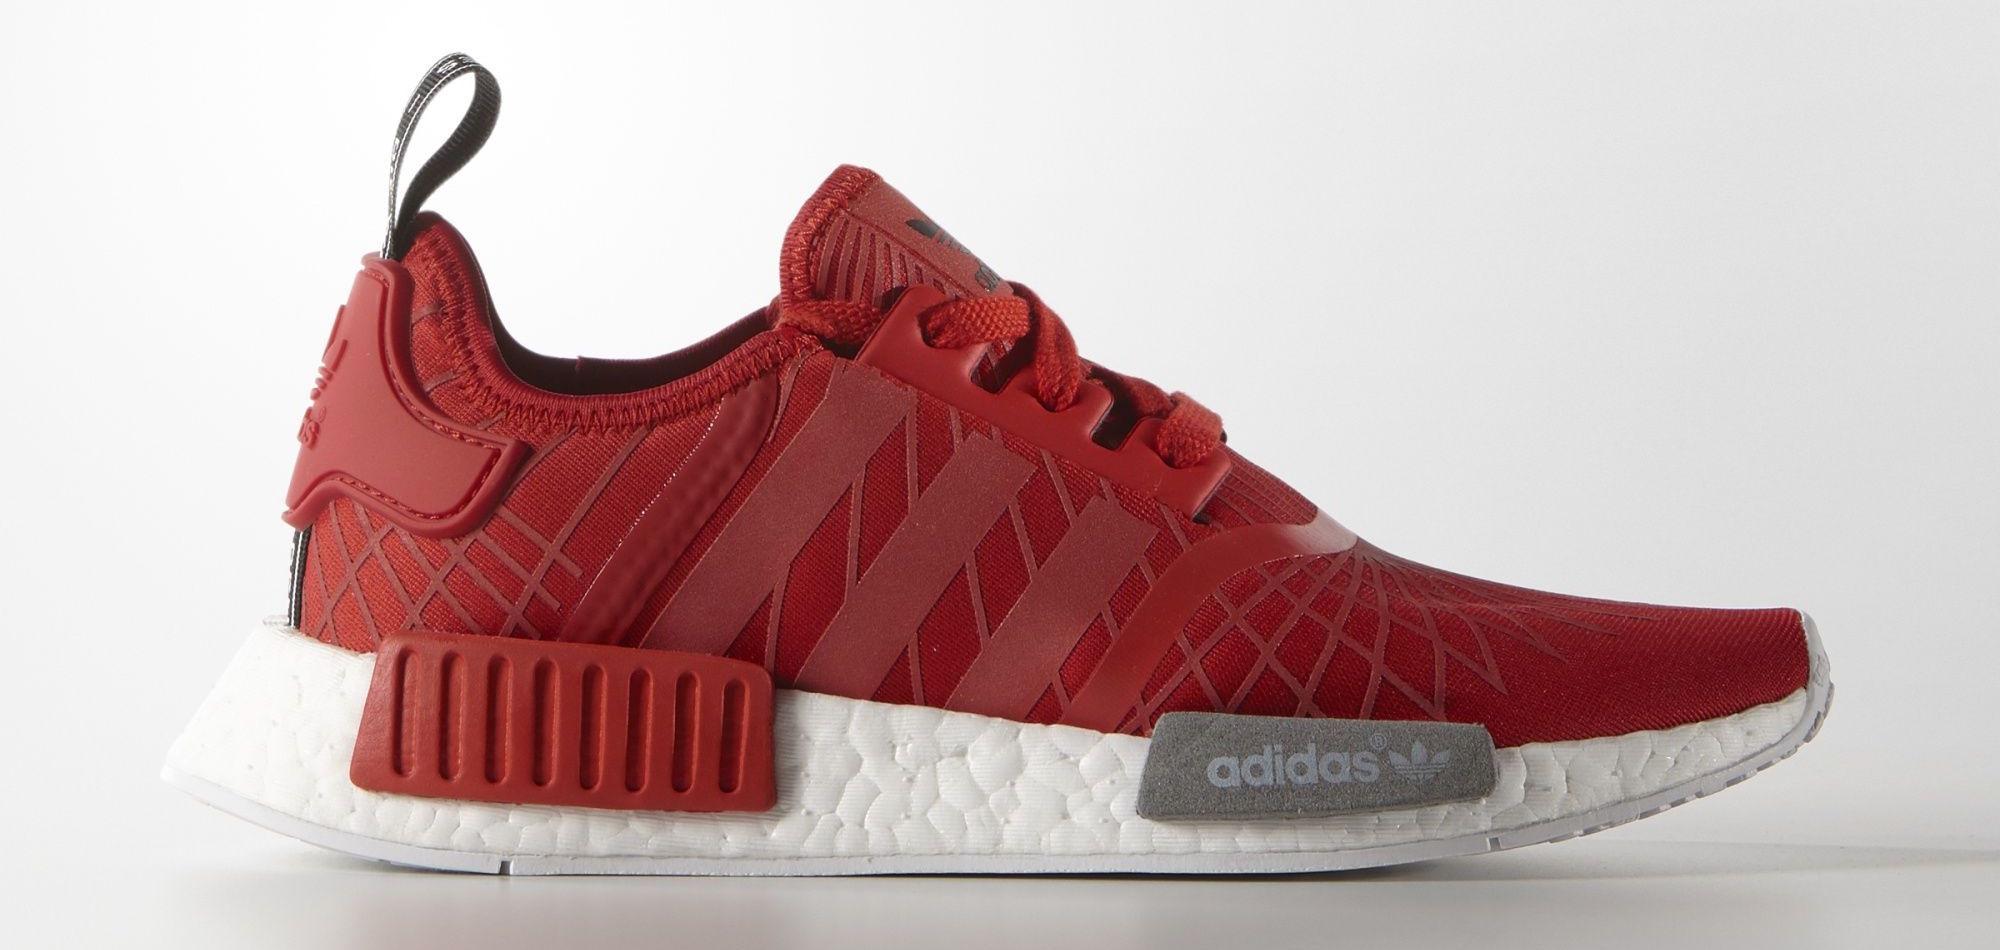 spain adidas nmd runner lush red 6c842 af794